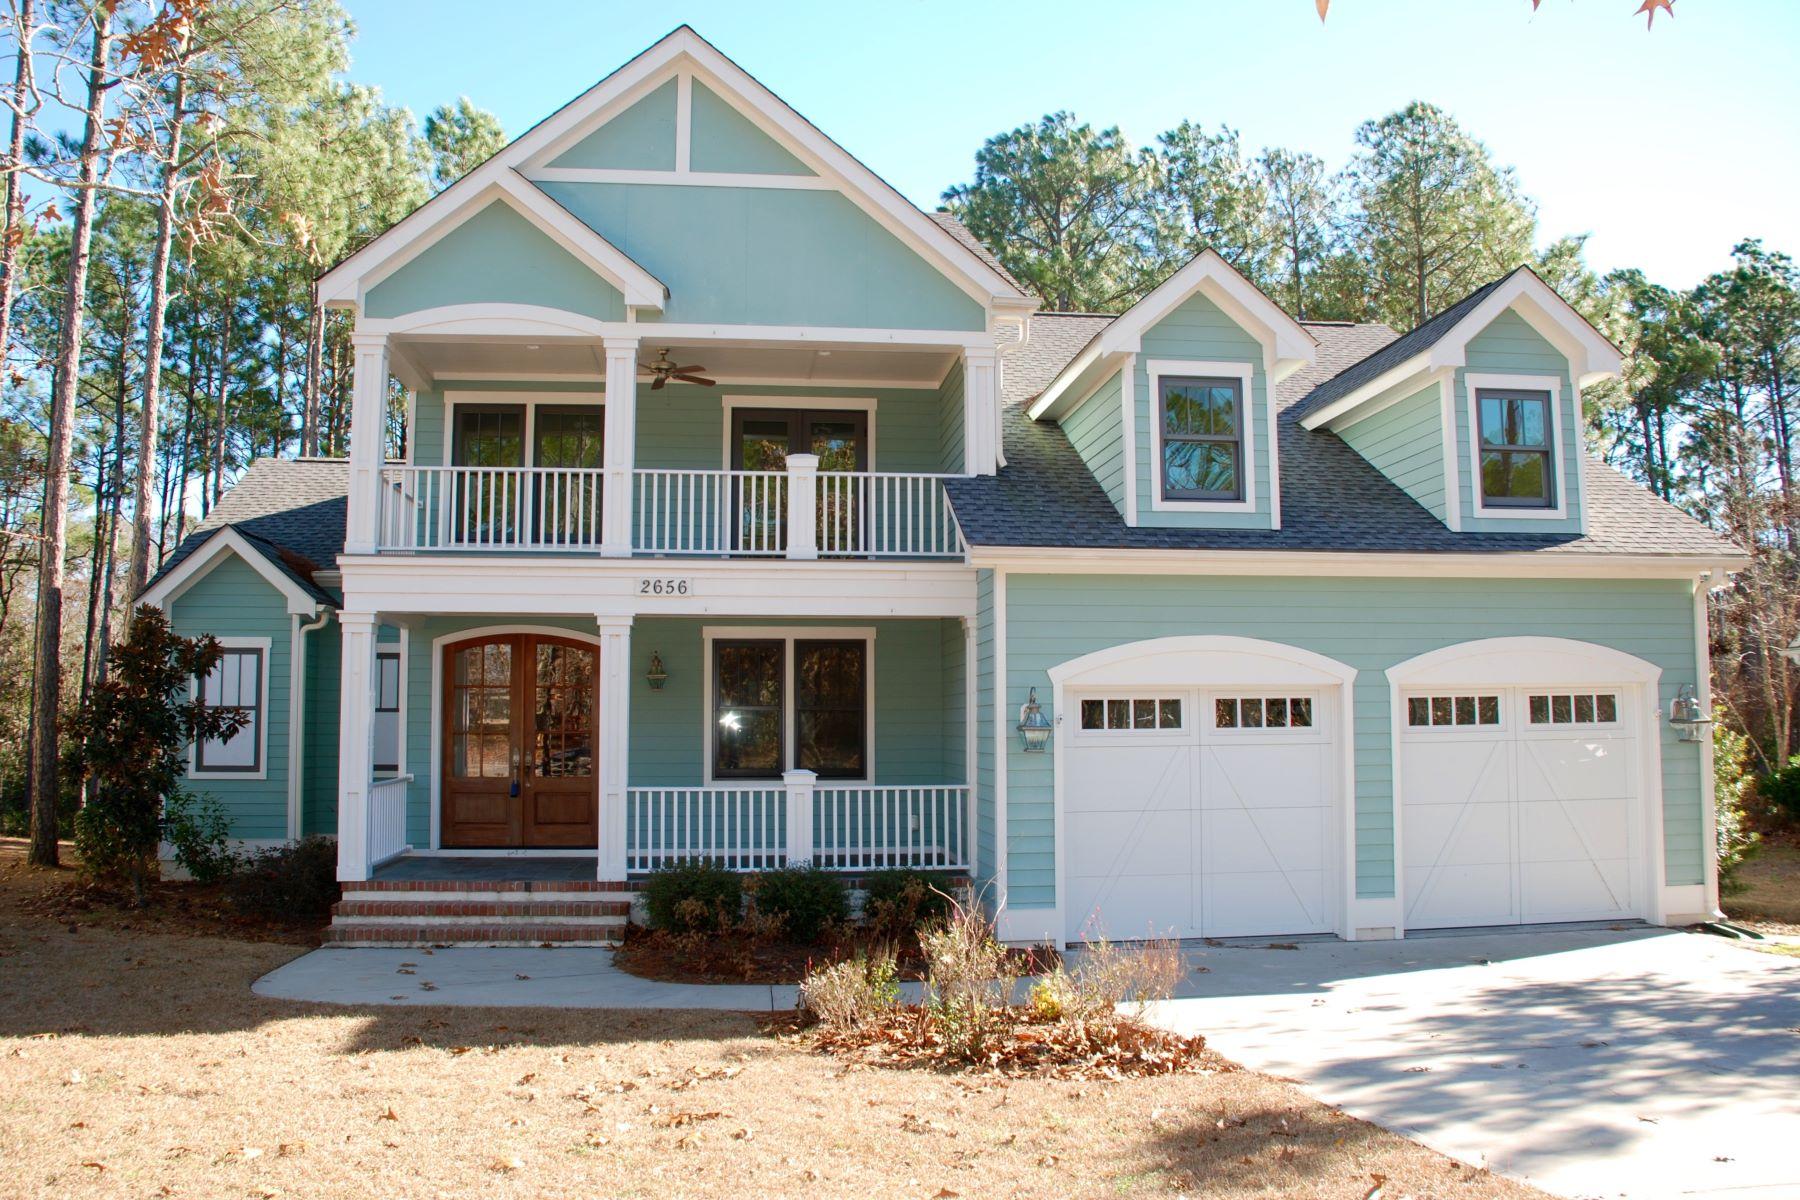 Casa Unifamiliar por un Venta en Custom home with numerous upgrades & designer finishes 2656 Park Ridge Drive Southport, Carolina Del Norte 28461 Estados Unidos